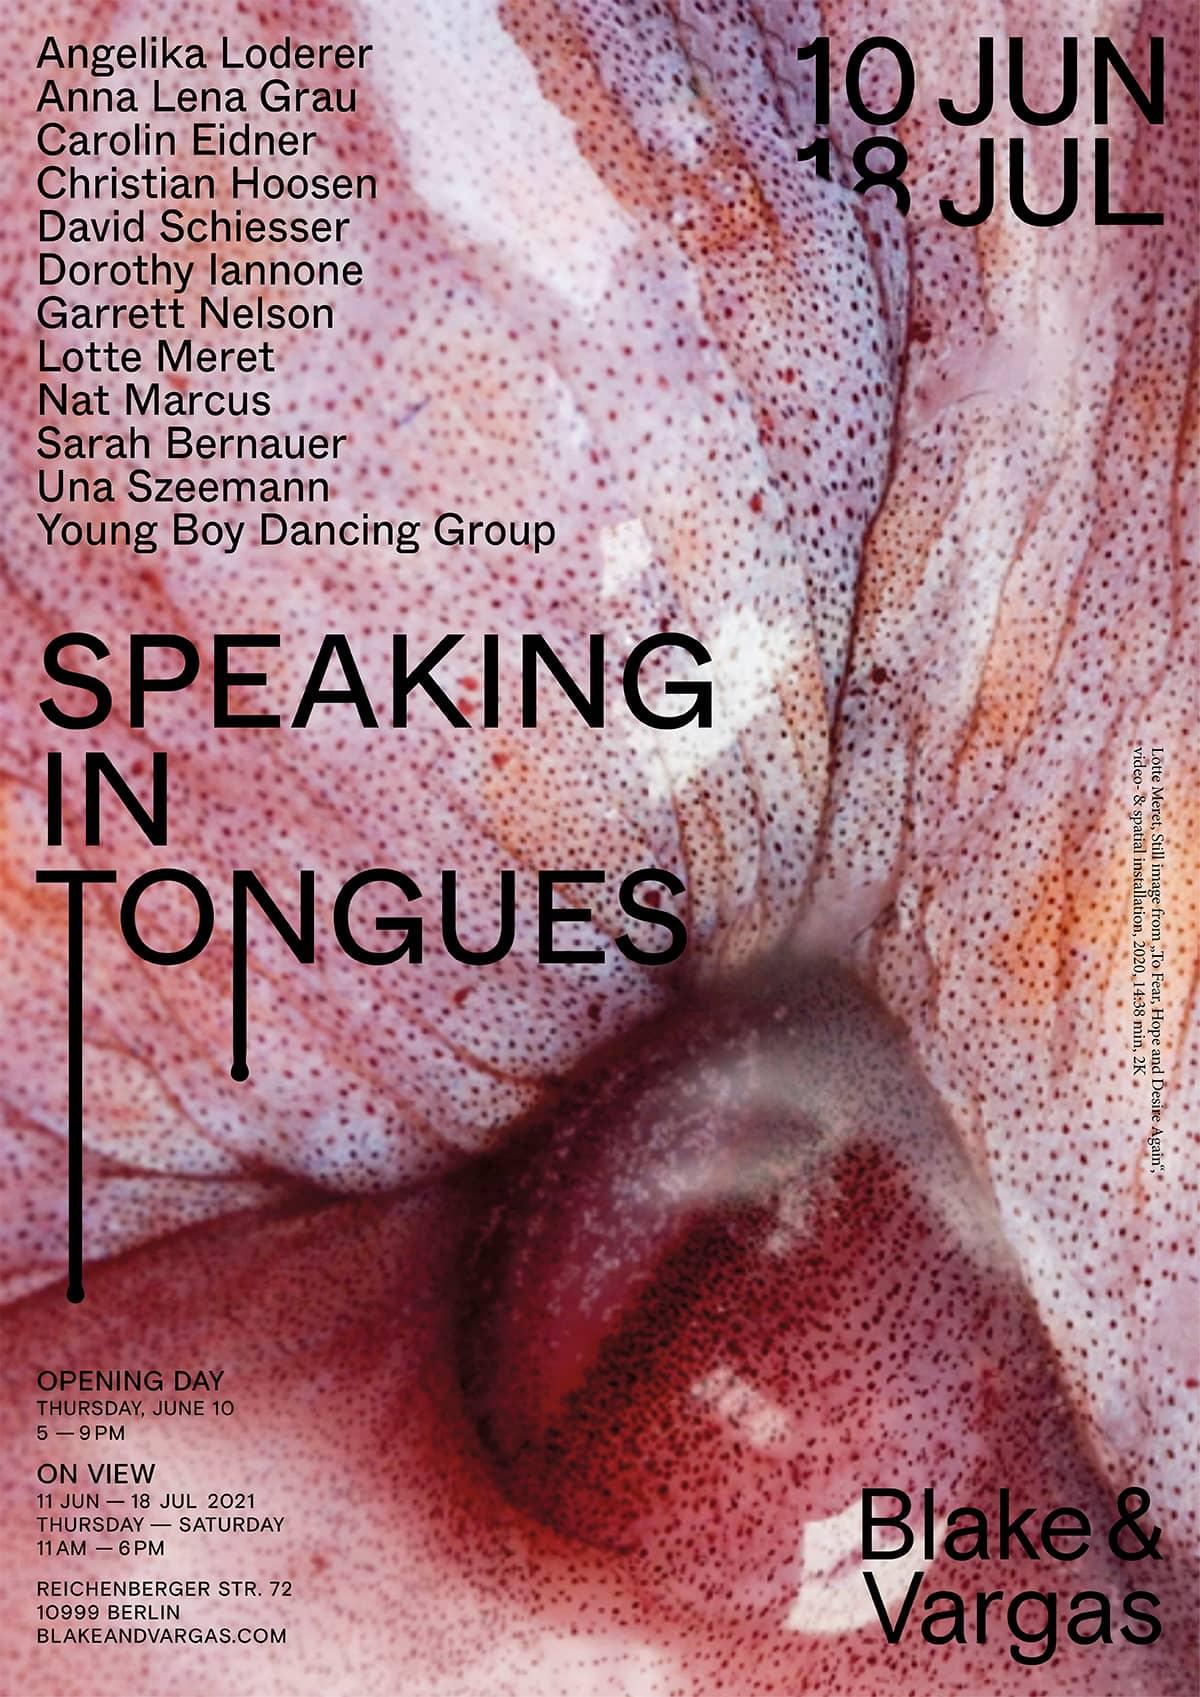 Speaking in Tongues at Blake and Vargas Studio Matthias Last 4